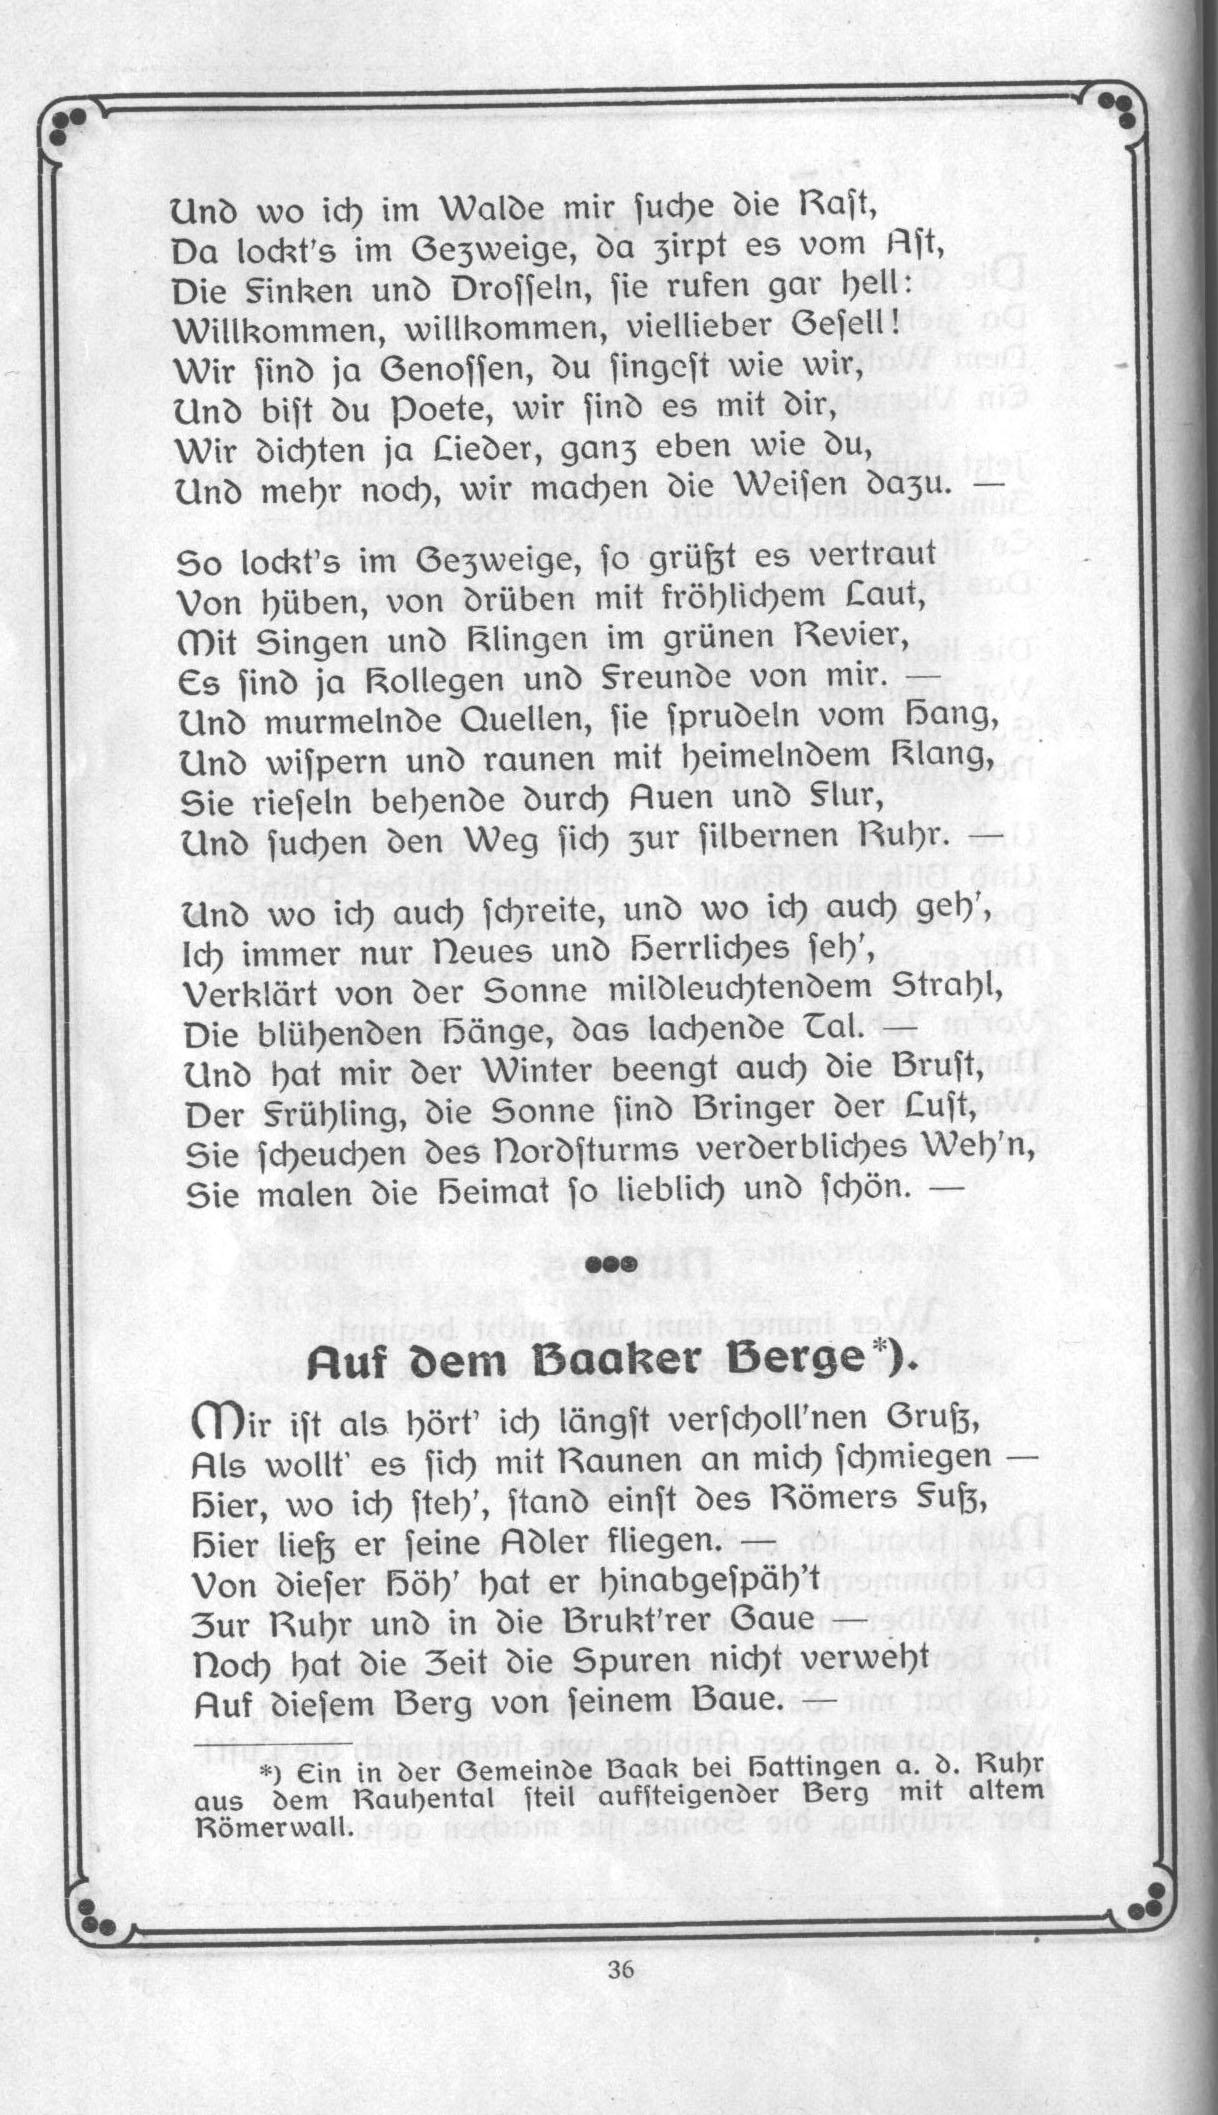 File:Was Die Ruhr Mir Sang (Kämpchen) 036.jpg - Wikimedia Commons